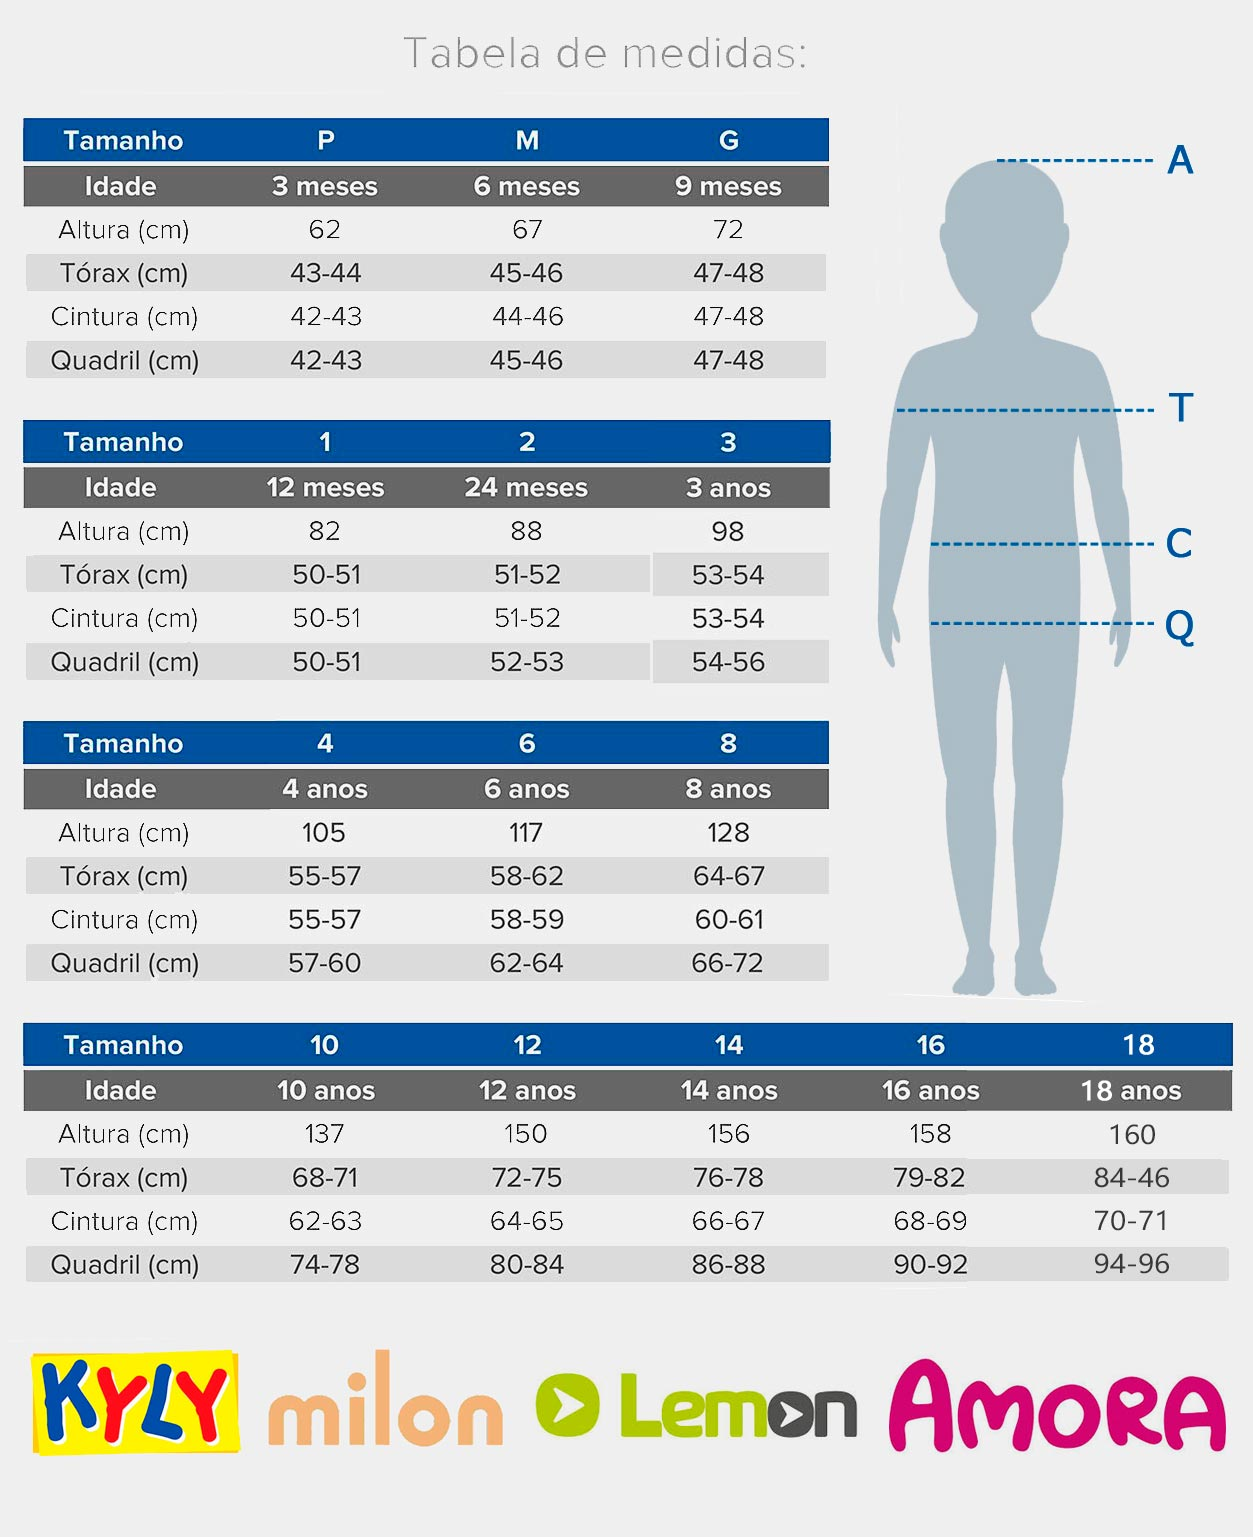 Conjunto Infantil Masculino Verão Branco Street - Kyly: Tabela de medidas